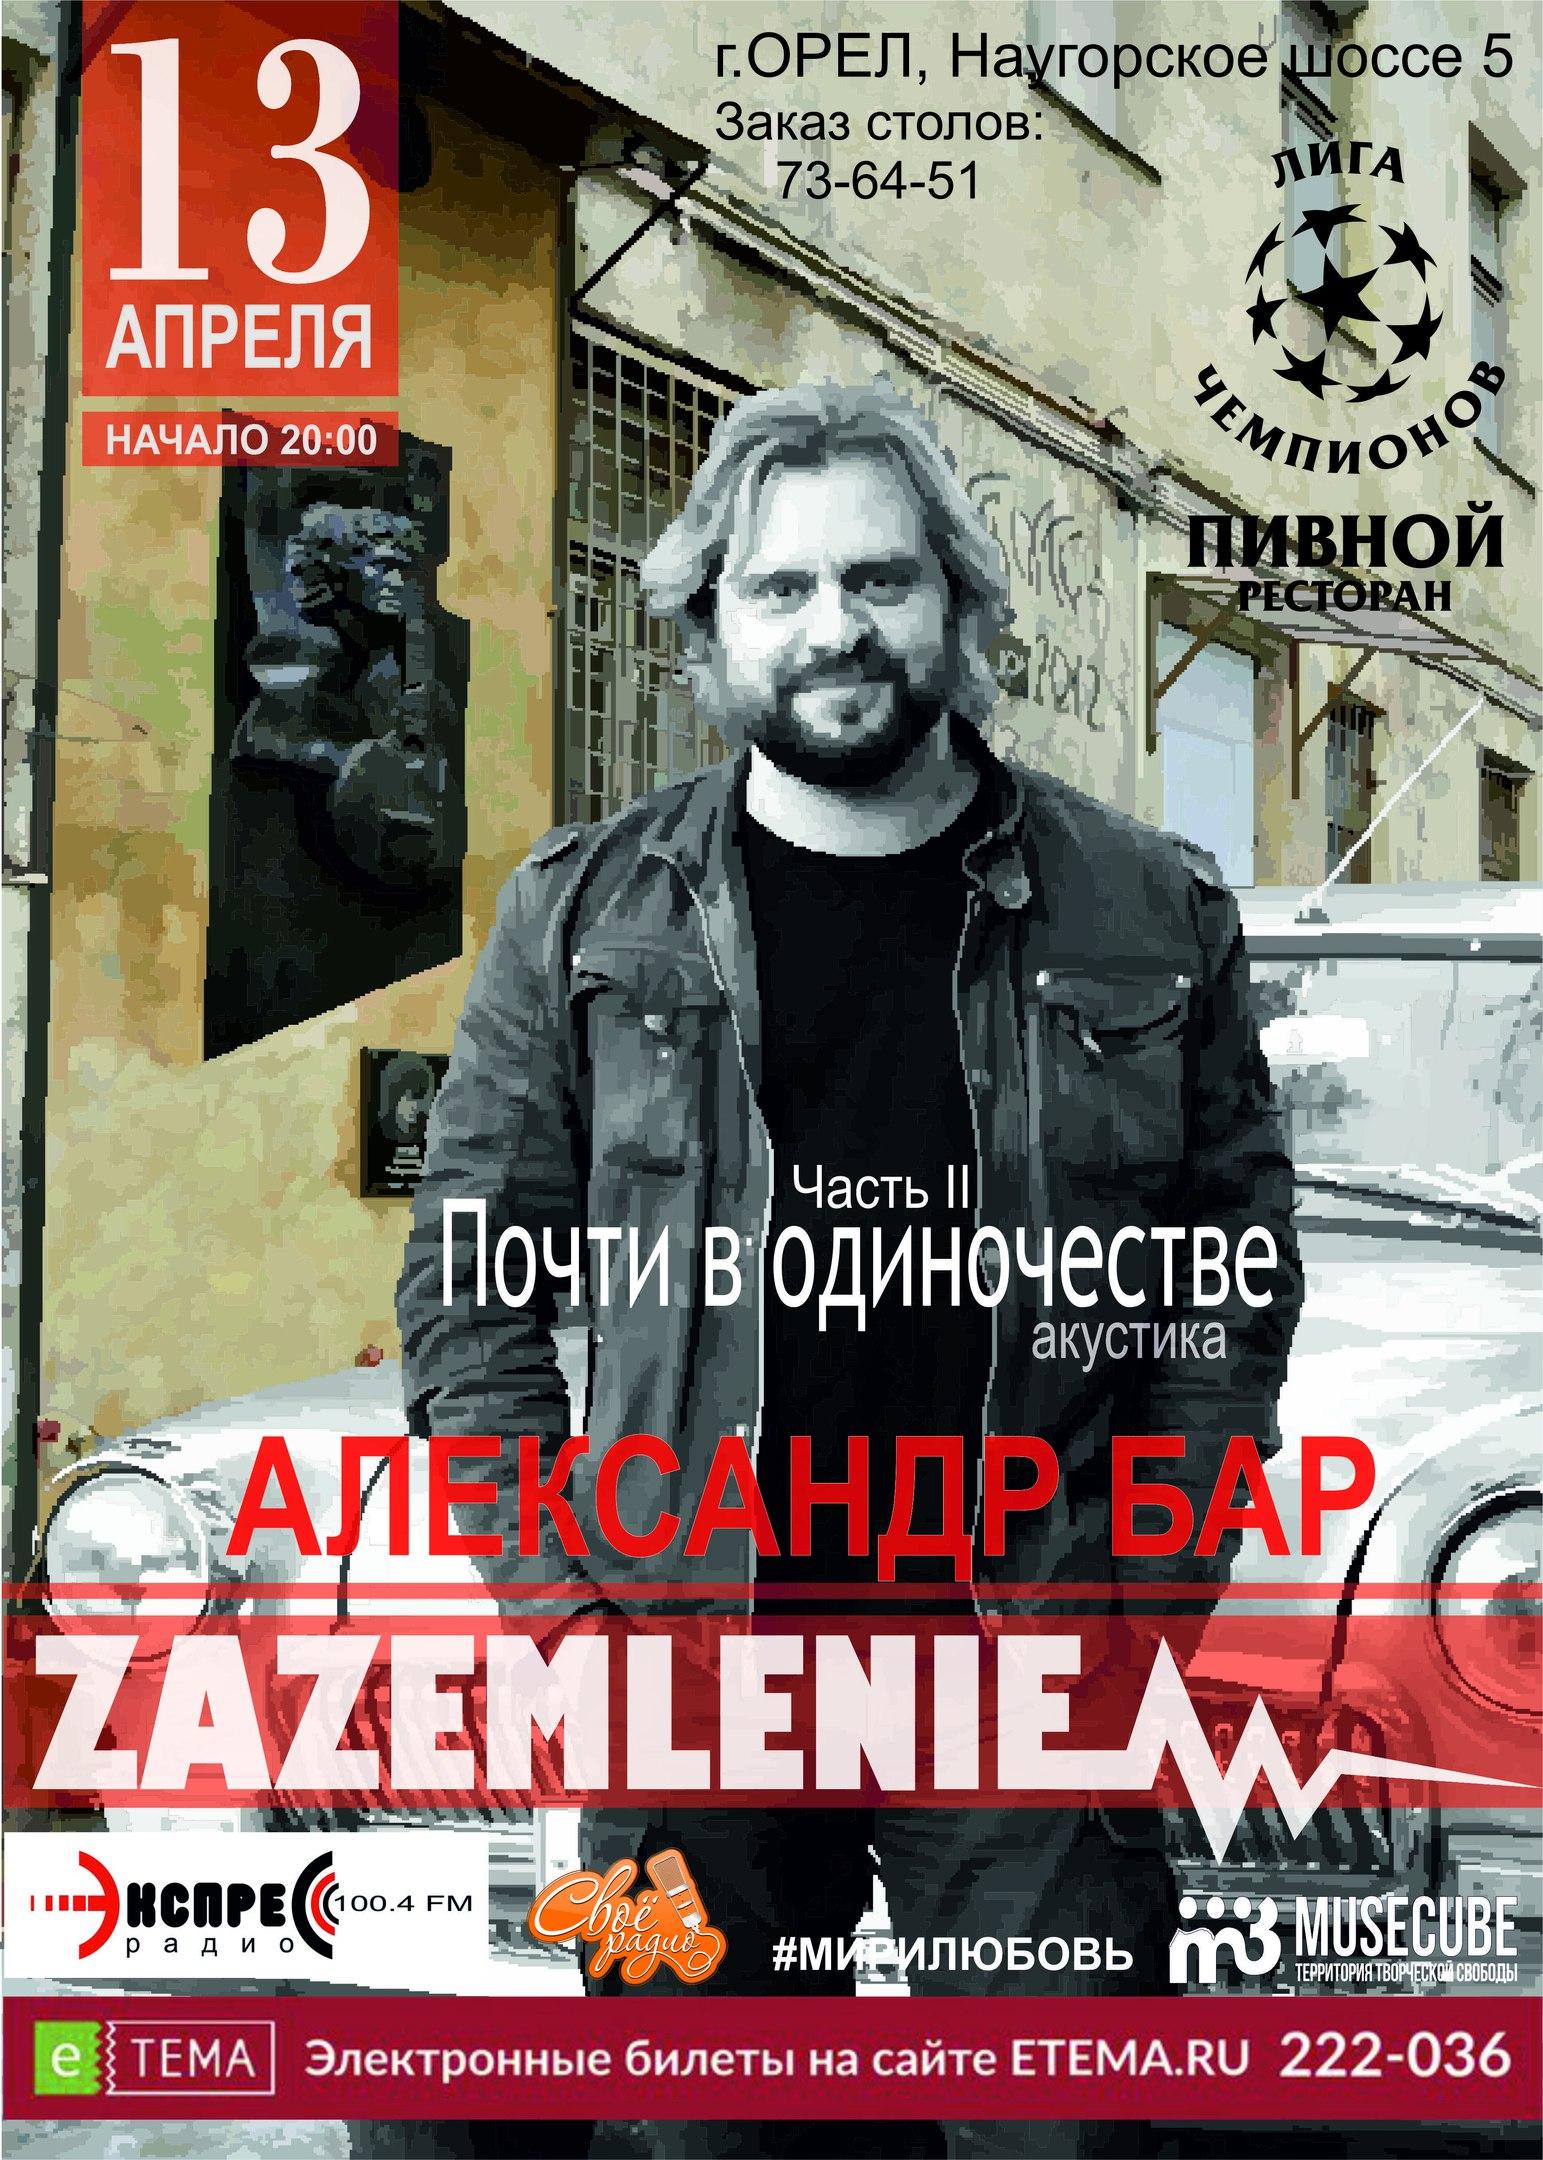 Александр Бар и гр. ZAZEMLENIE «Почти в одиночестве»